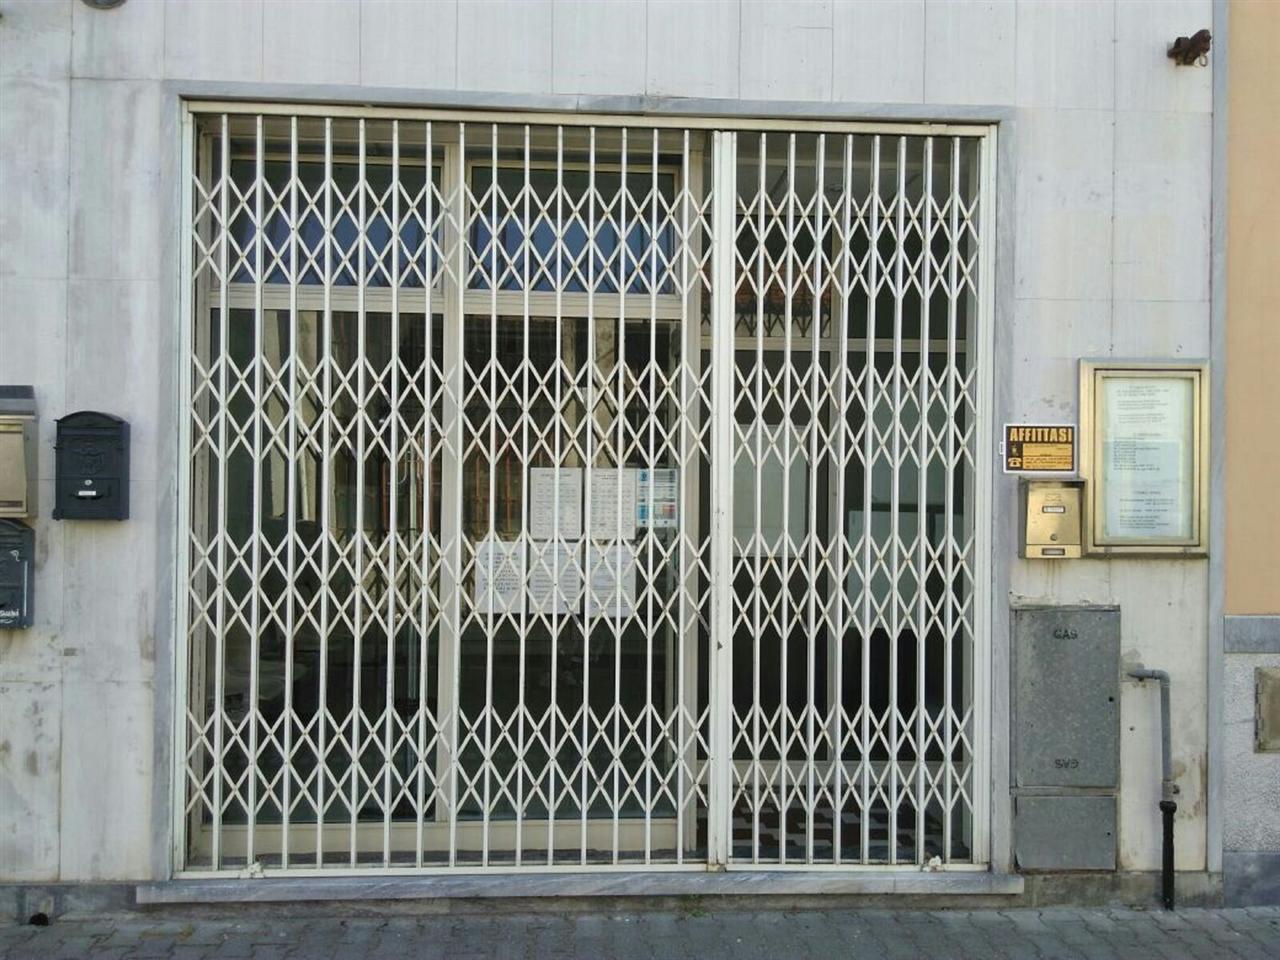 Affittasi fondo commerciale a marina Carrara centralissimo ottima posizione